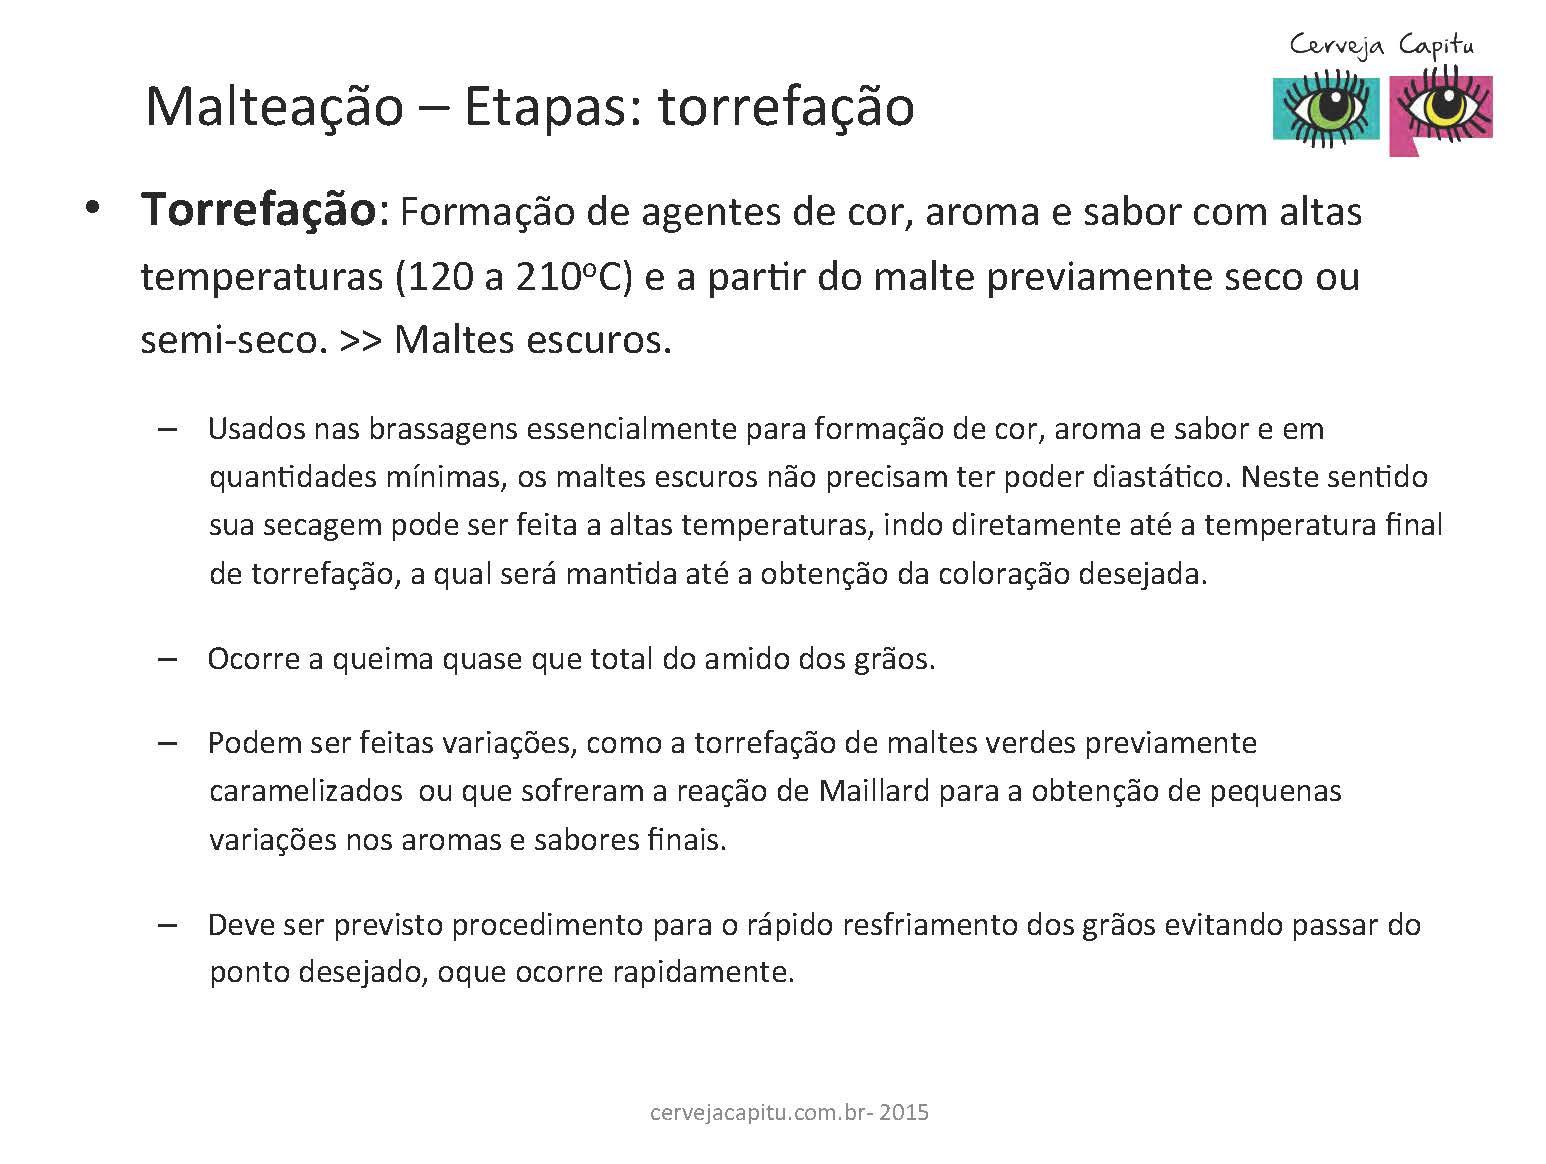 Princípios da Malteação_Capitu_SM_Page_11.jpg